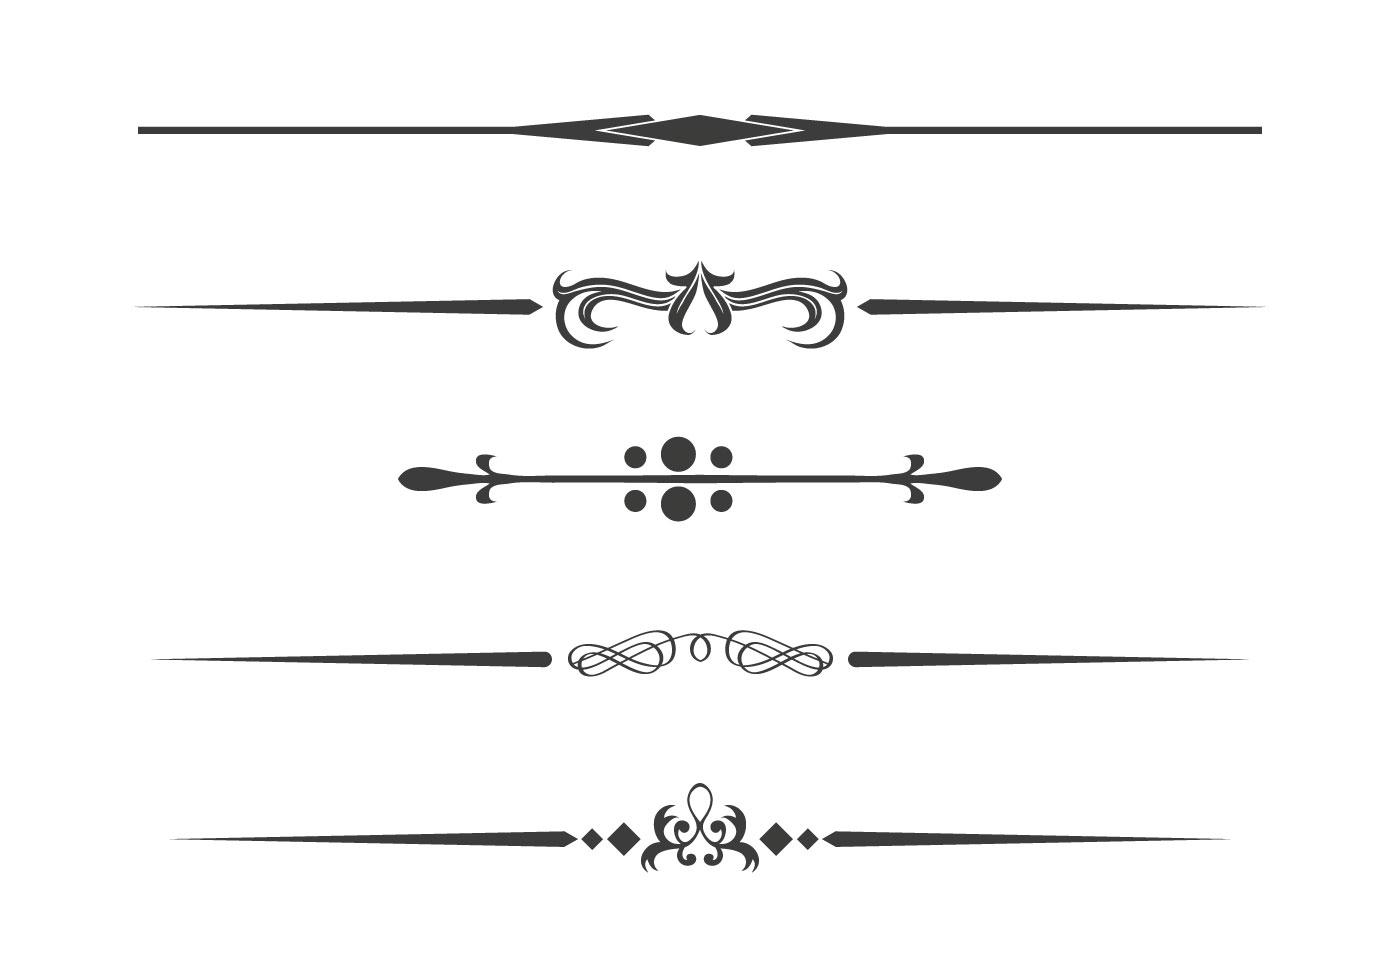 1400x980 Dividers Free Vector Art